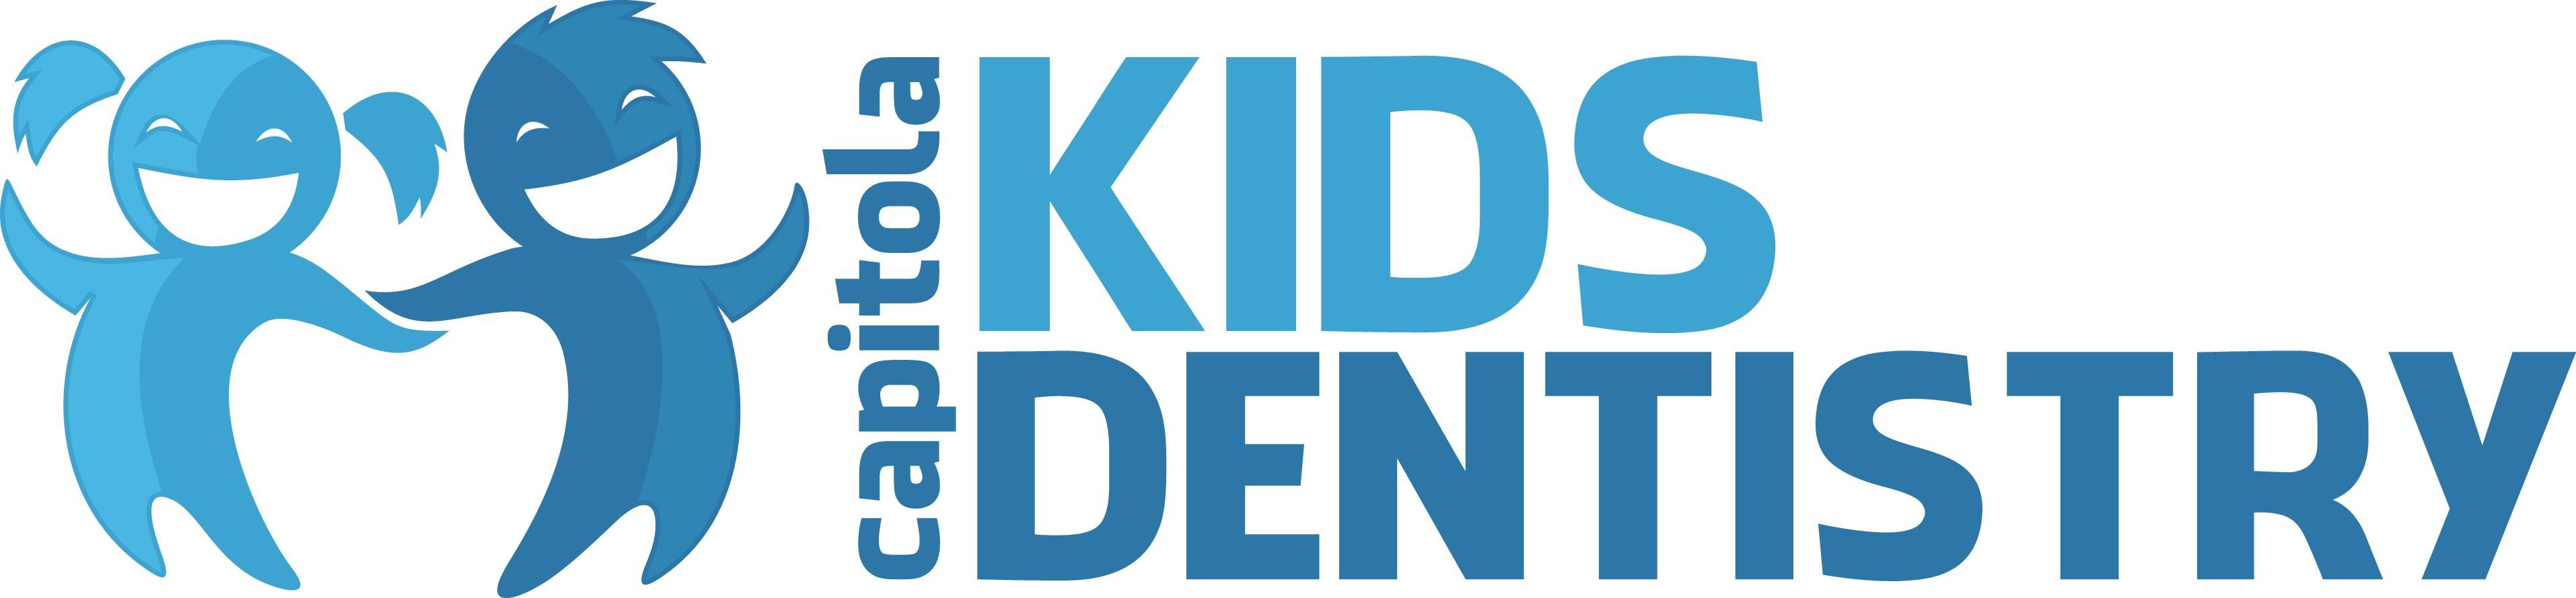 Fun logo for a Kids dental office. Surf/sun/ocean vibe. Cute, kid & parent oriented but think good design